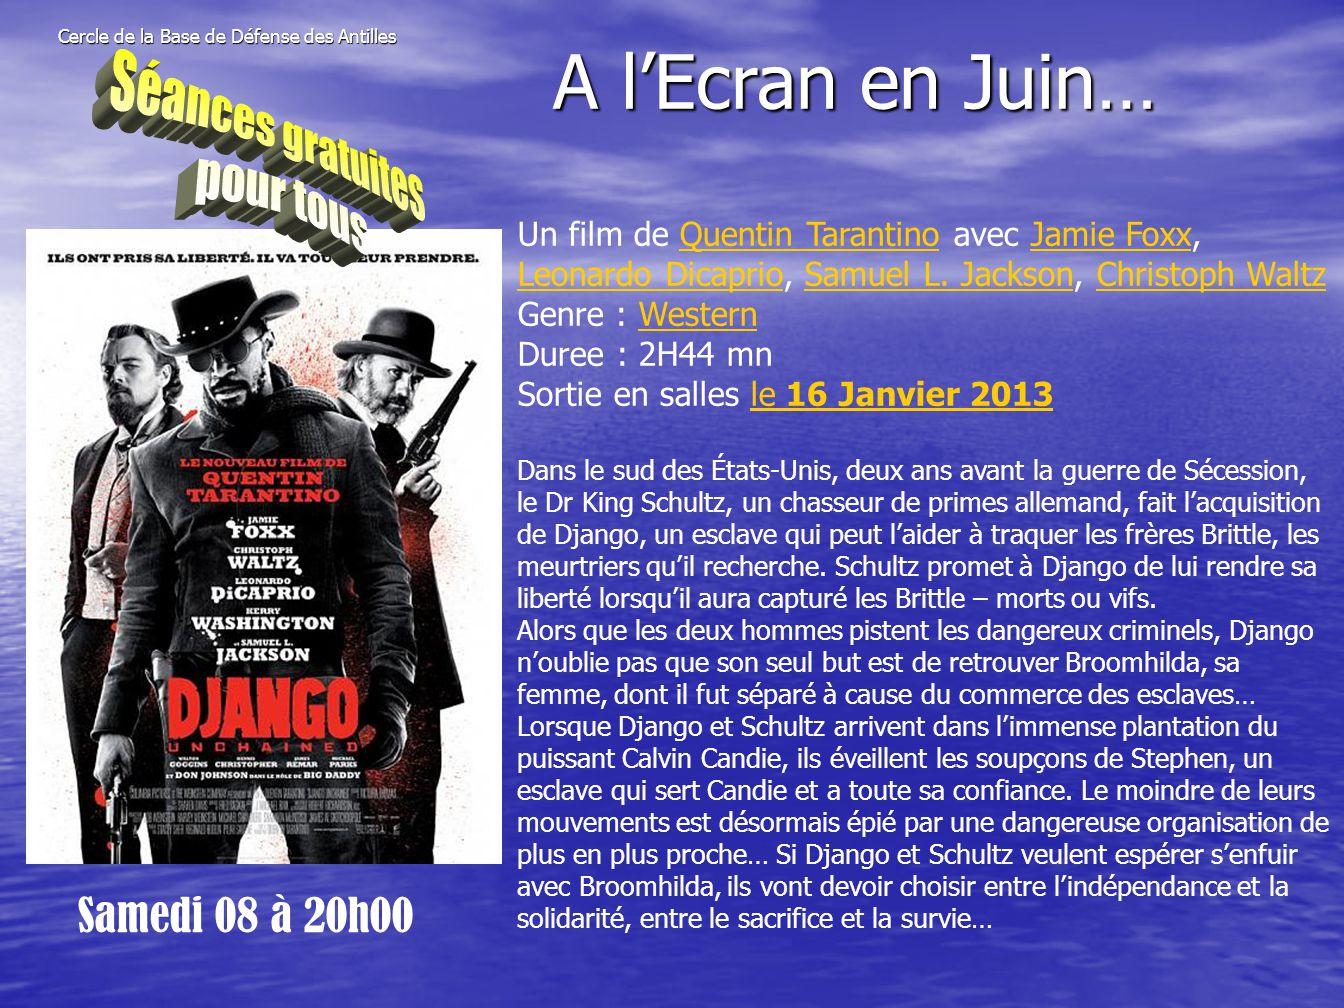 Cercle de la Base de Défense des Antilles Samedi 08 à 20h00 A l'Ecran en Juin… Un film de Quentin Tarantino avec Jamie Foxx, Leonardo Dicaprio, Samuel